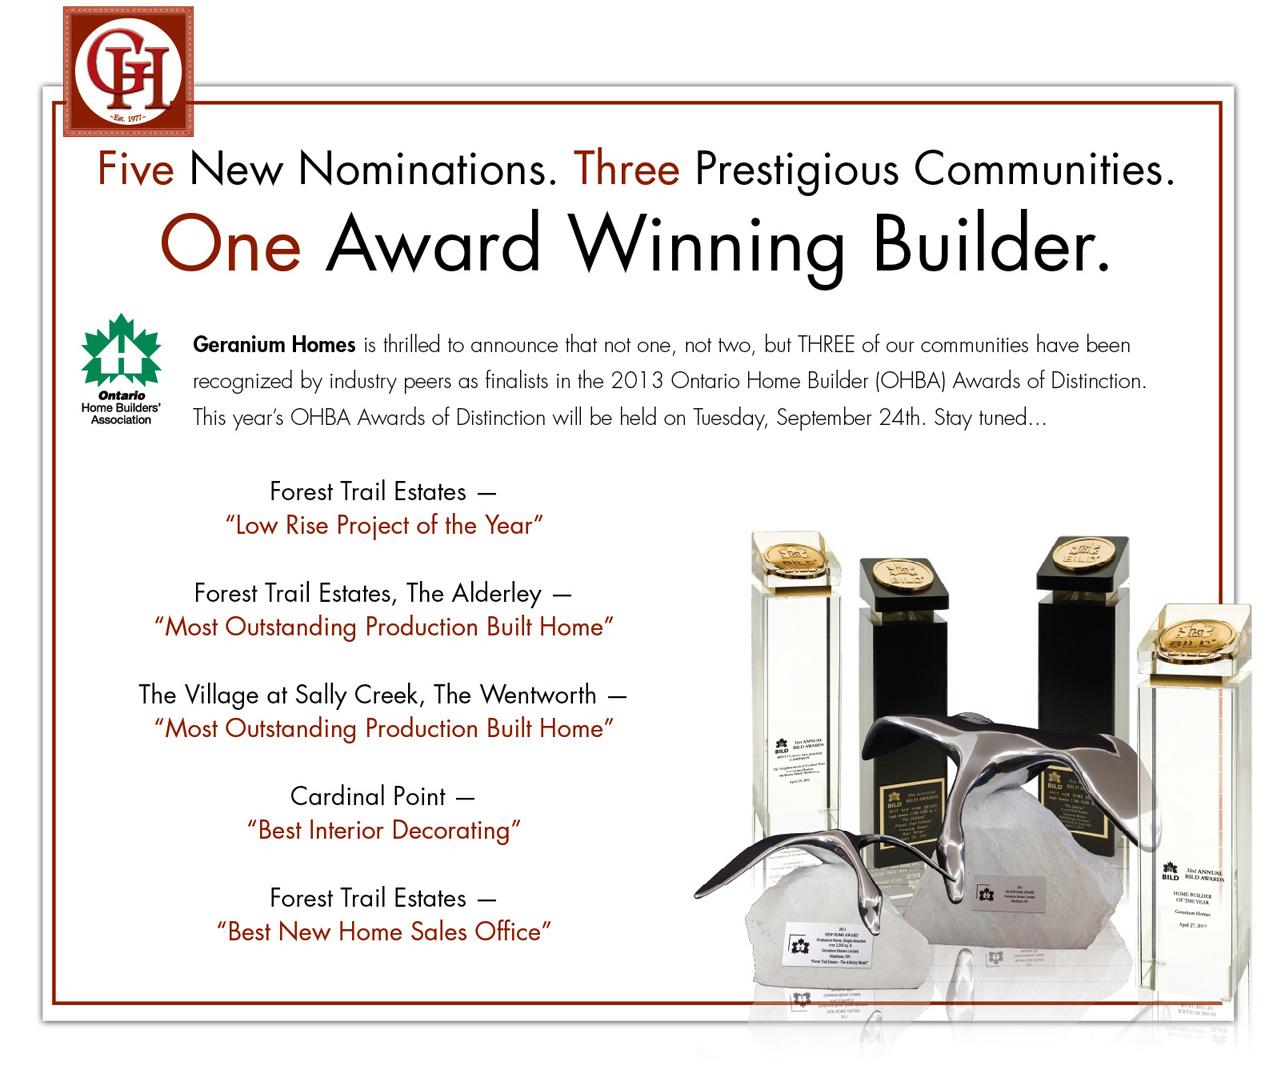 OHBA Awards of Distinction